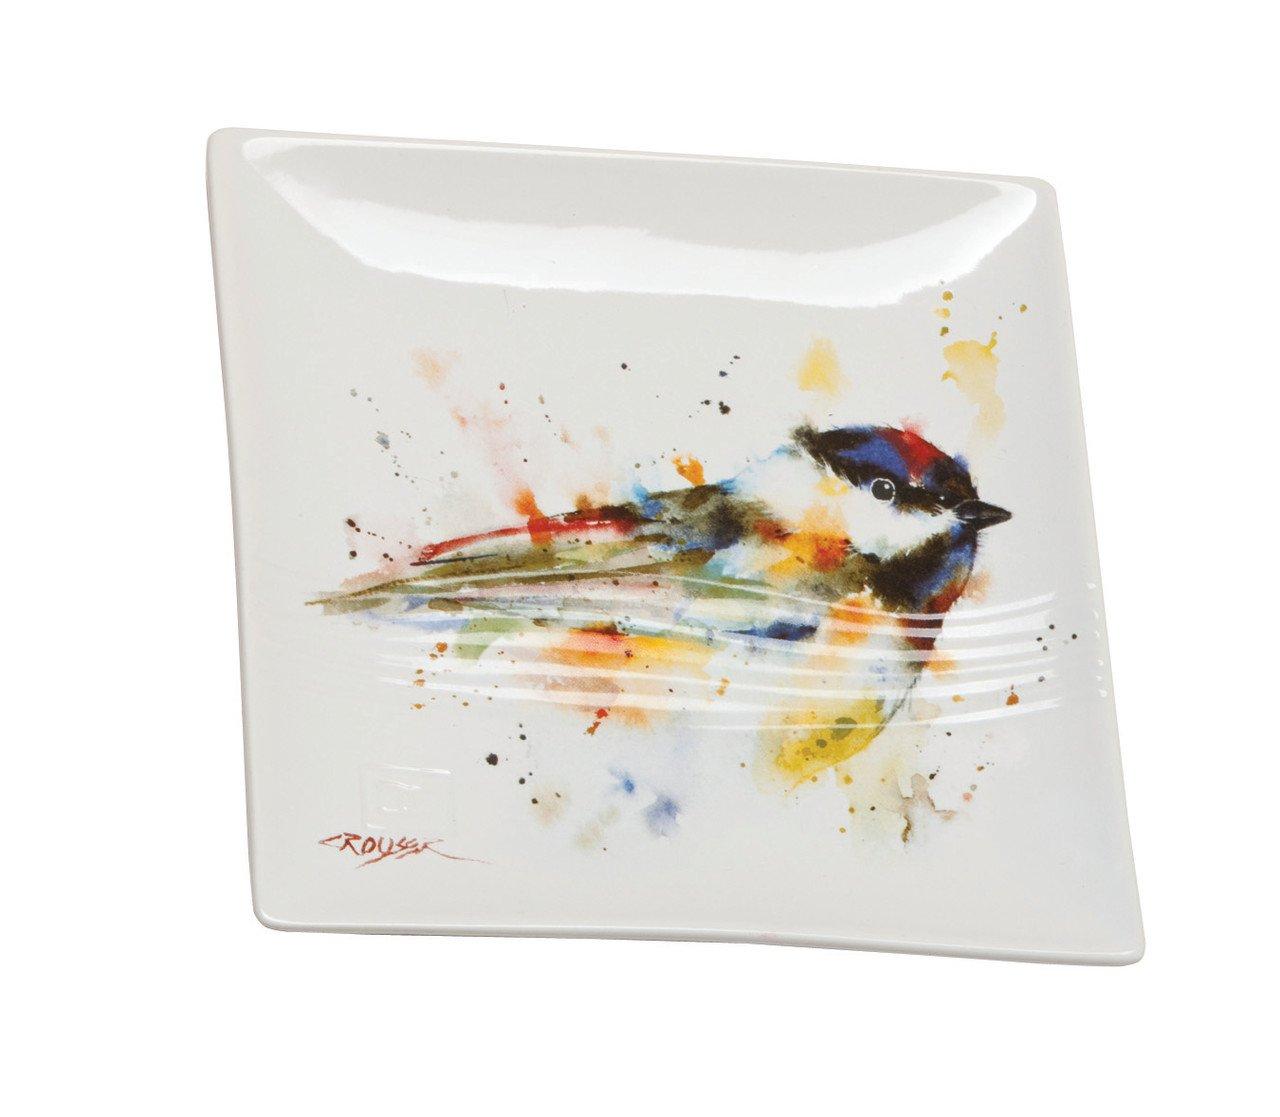 Demdaco B5050117 Big Sky Carvers Chickadee Snack Plate, Multicolored